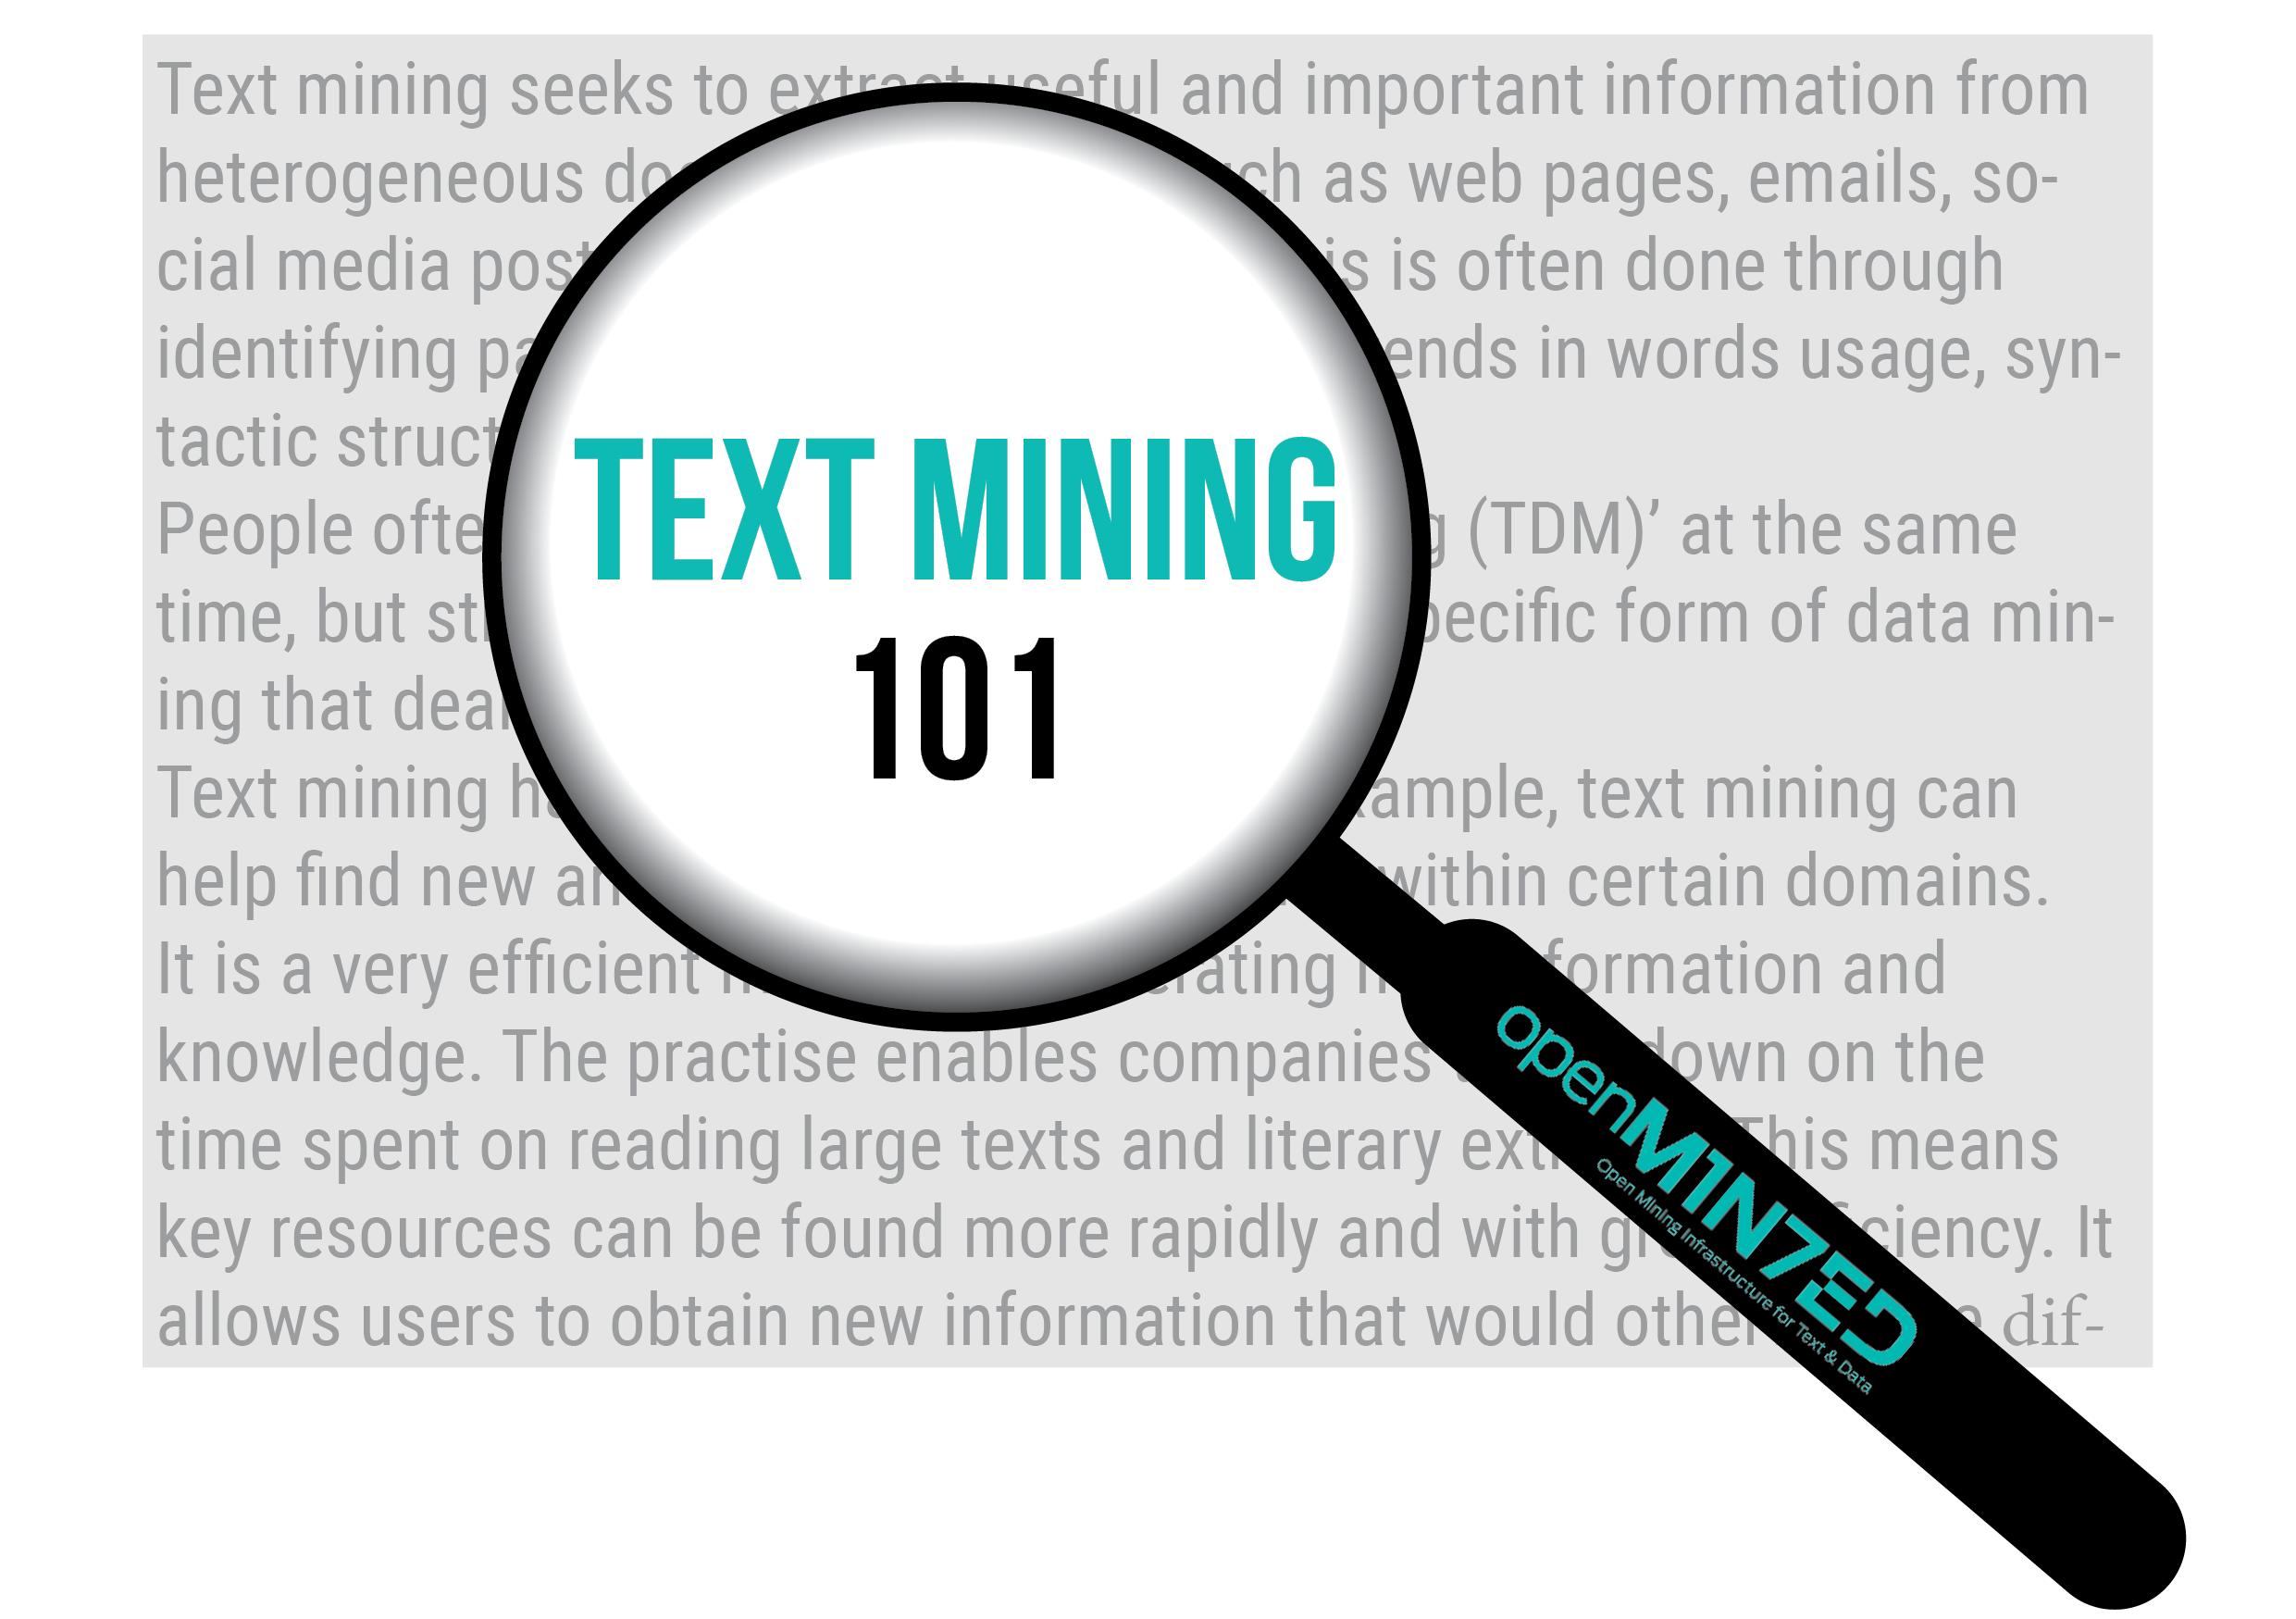 Text mining 101